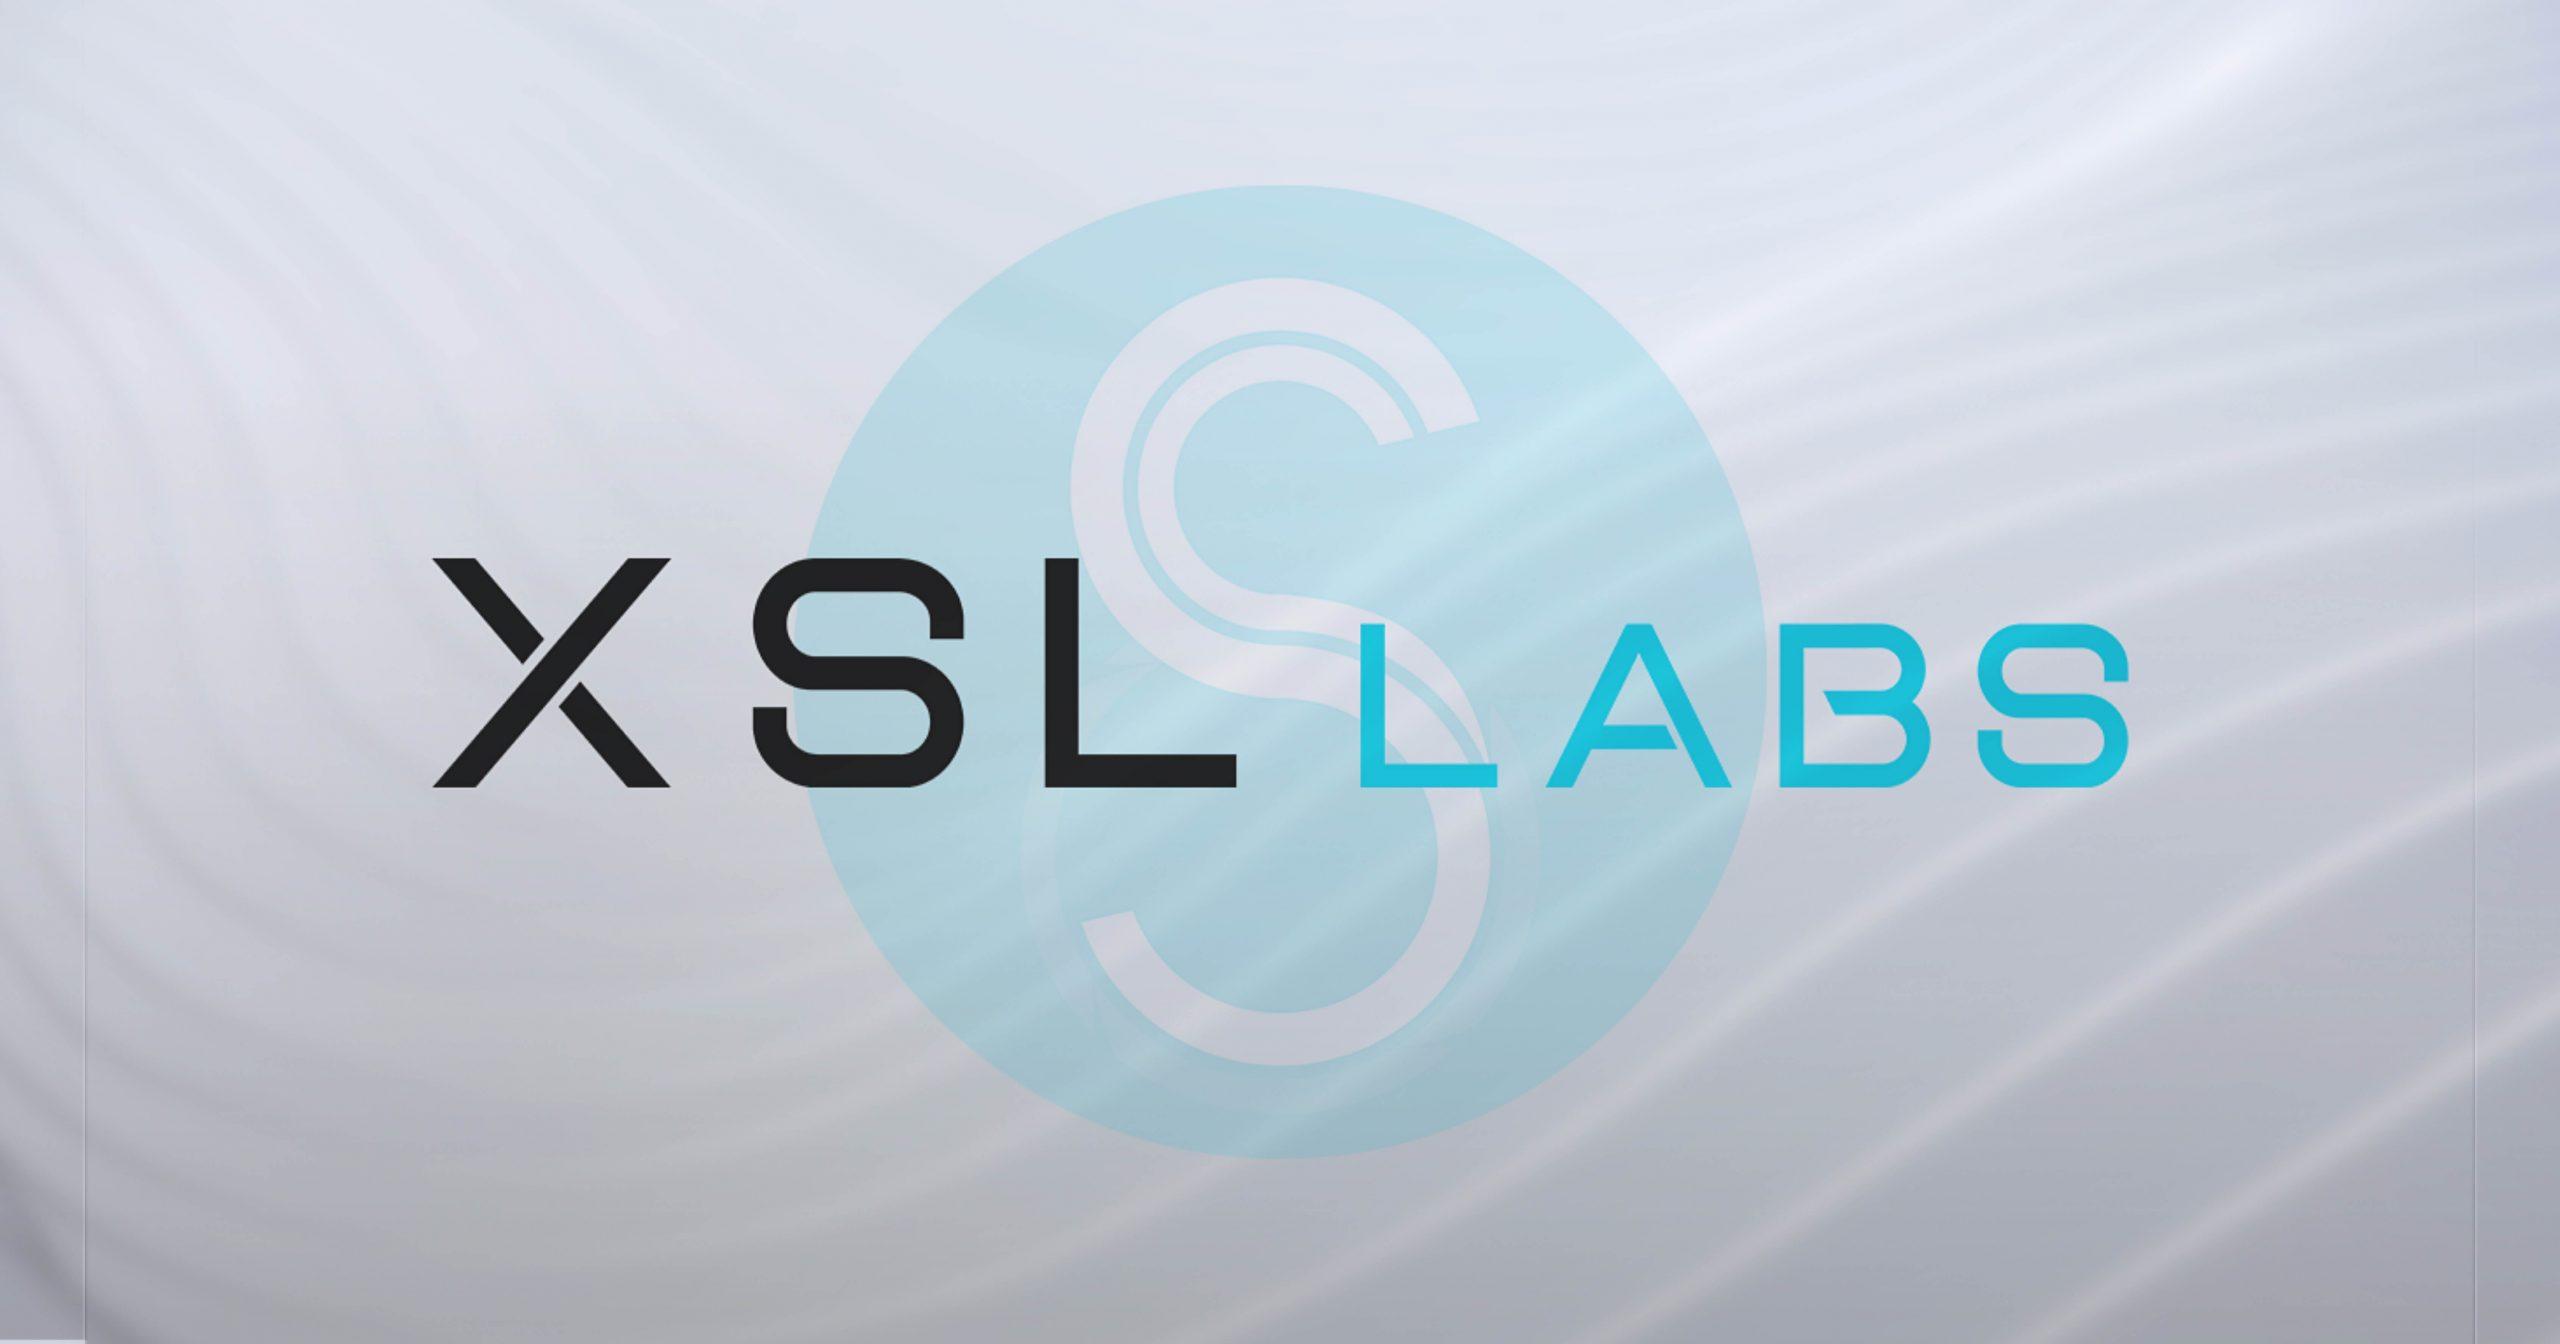 Xsl labs scaled